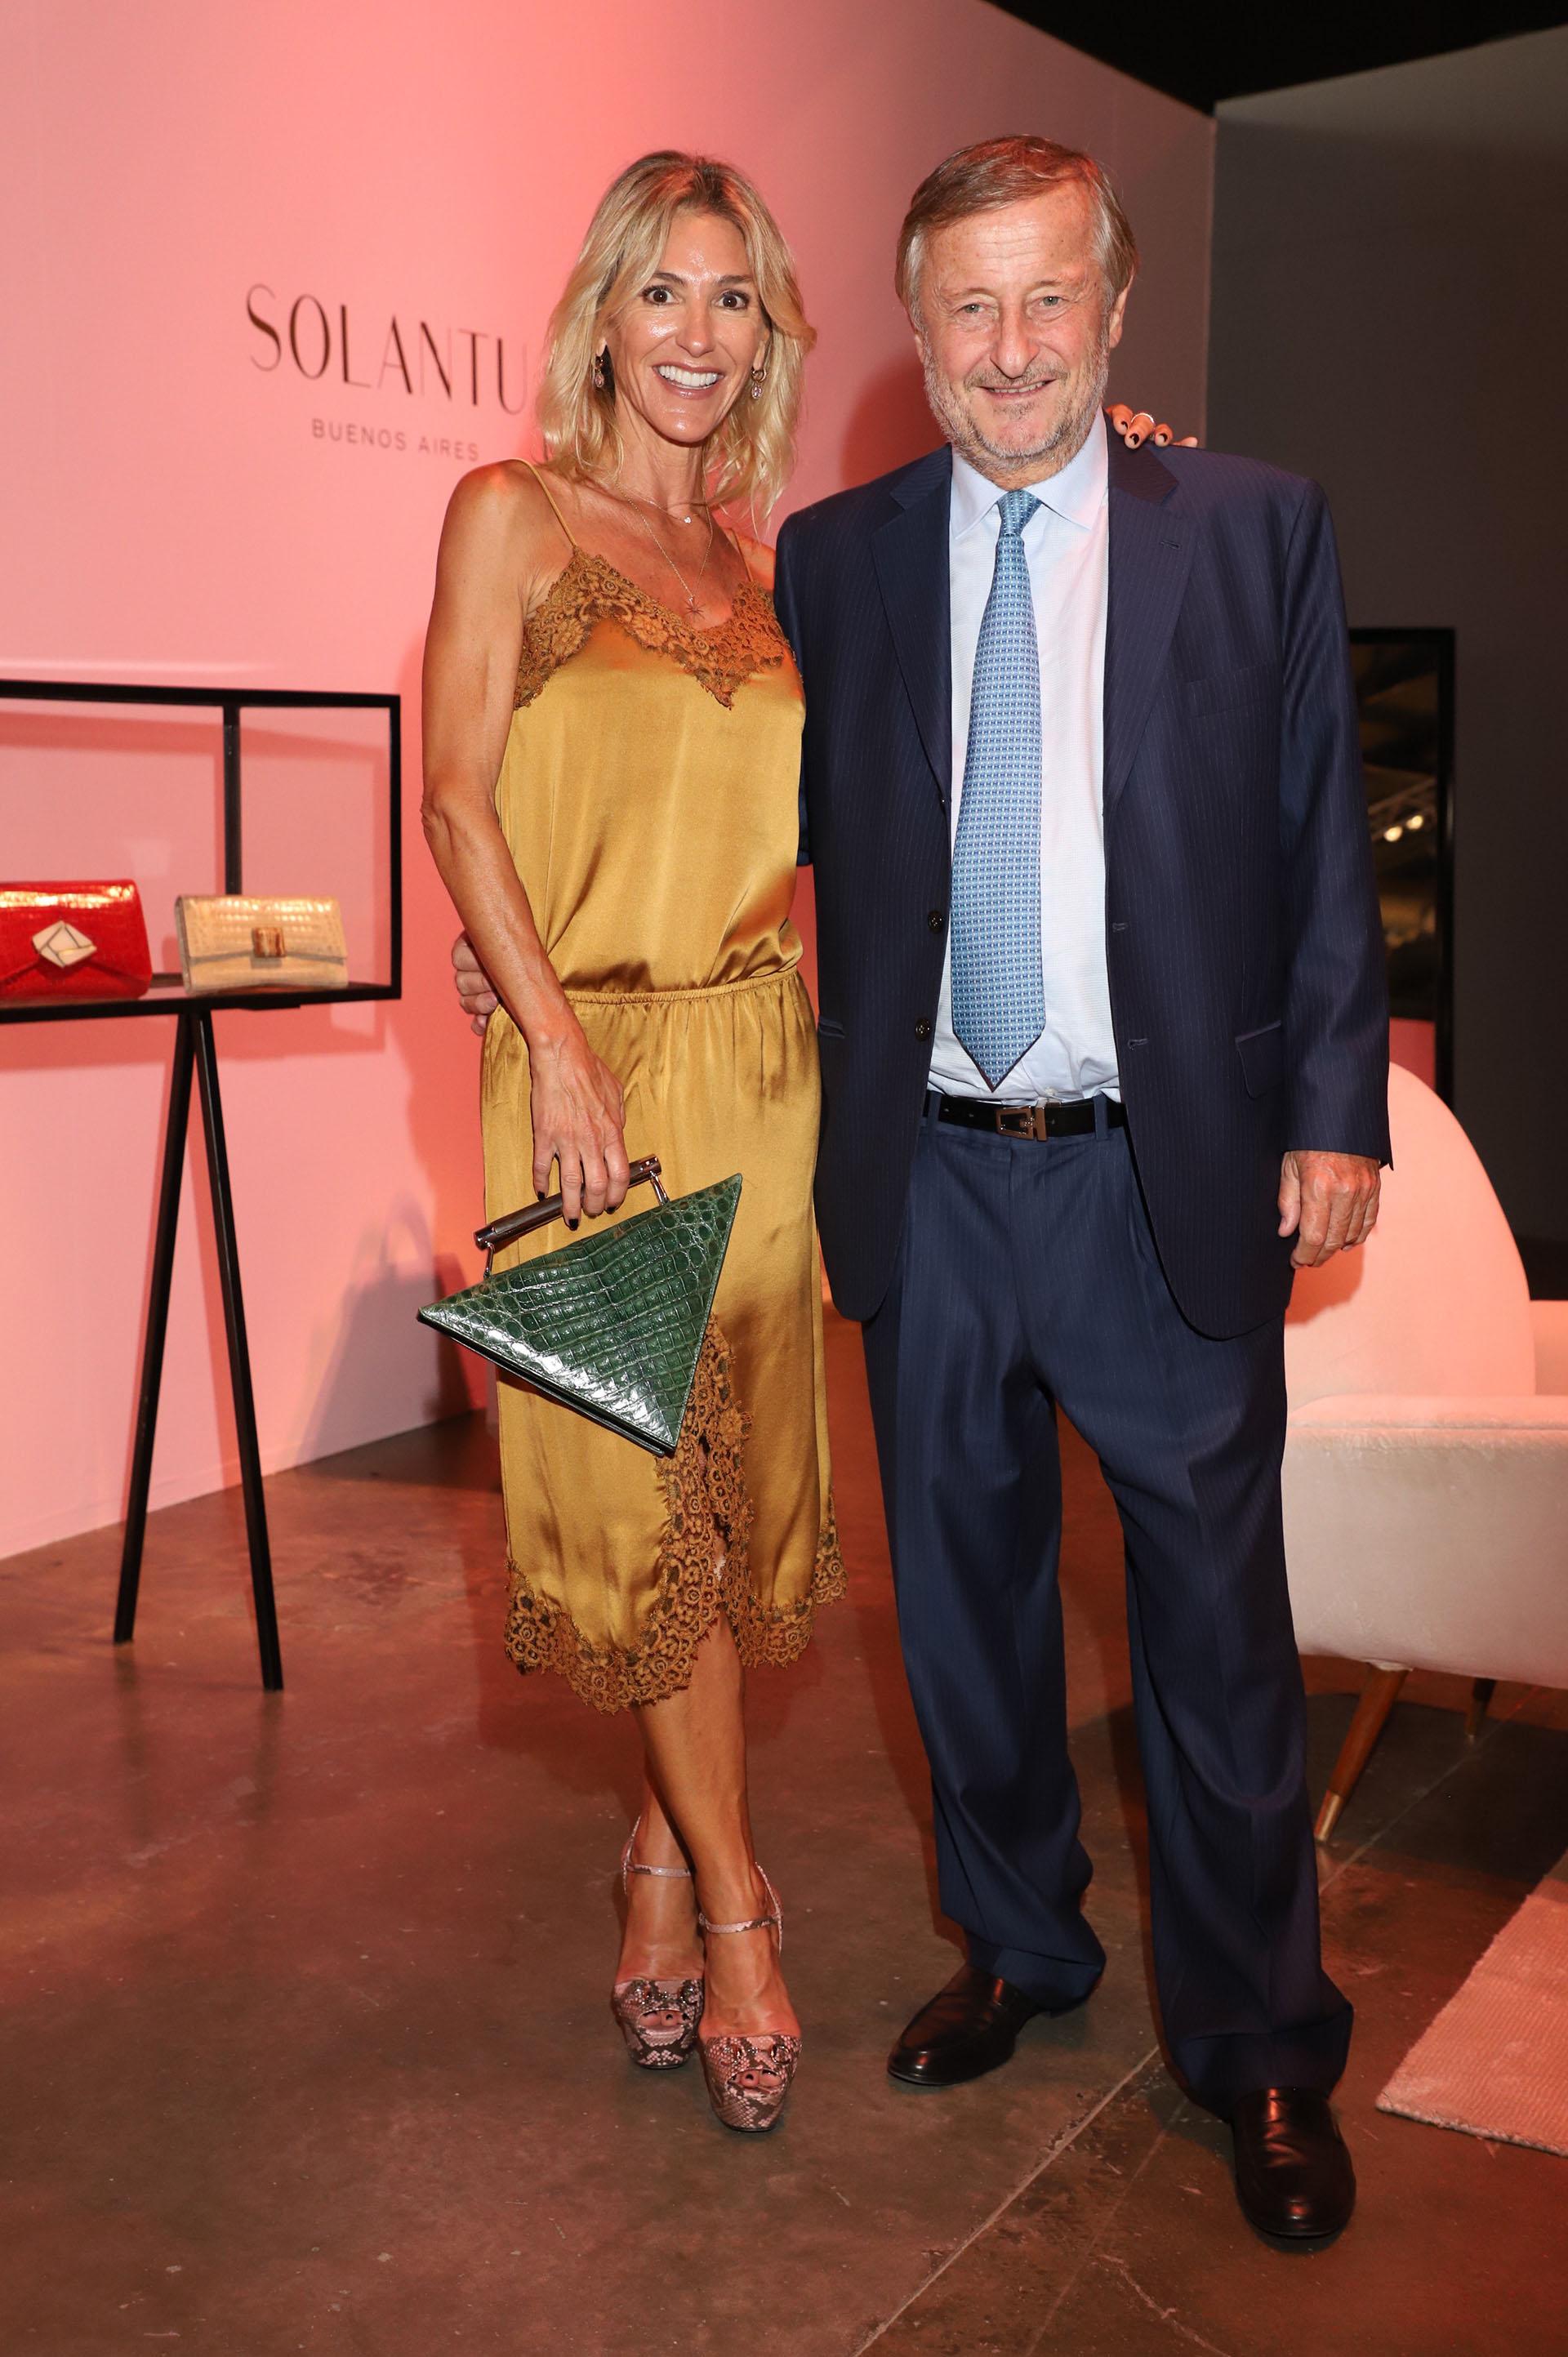 Gabriela Castellani y Cristiano Rattazzi en el lounge